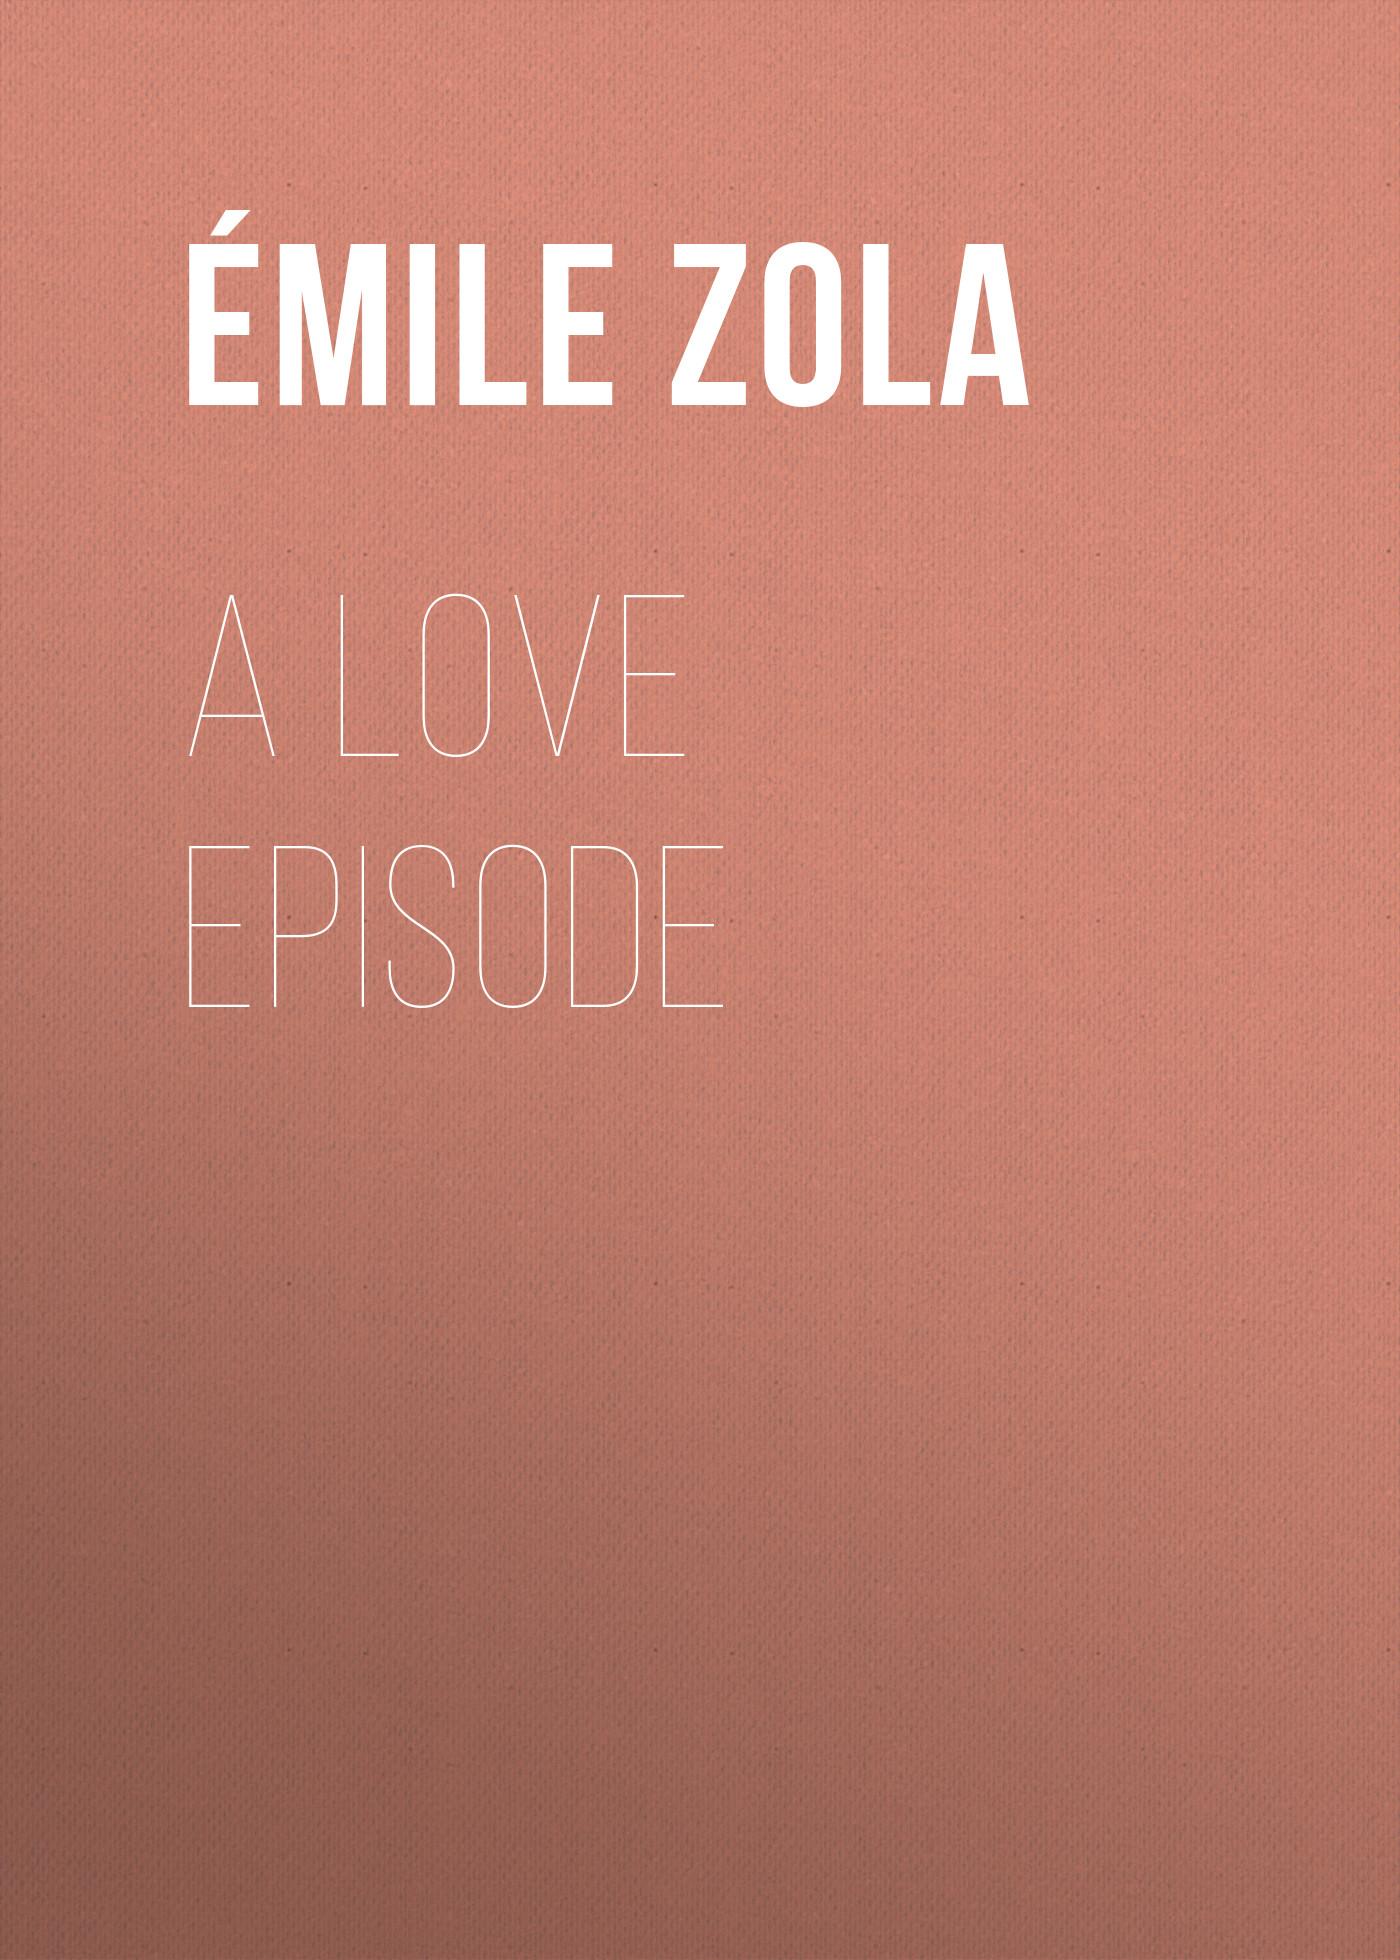 a love episode